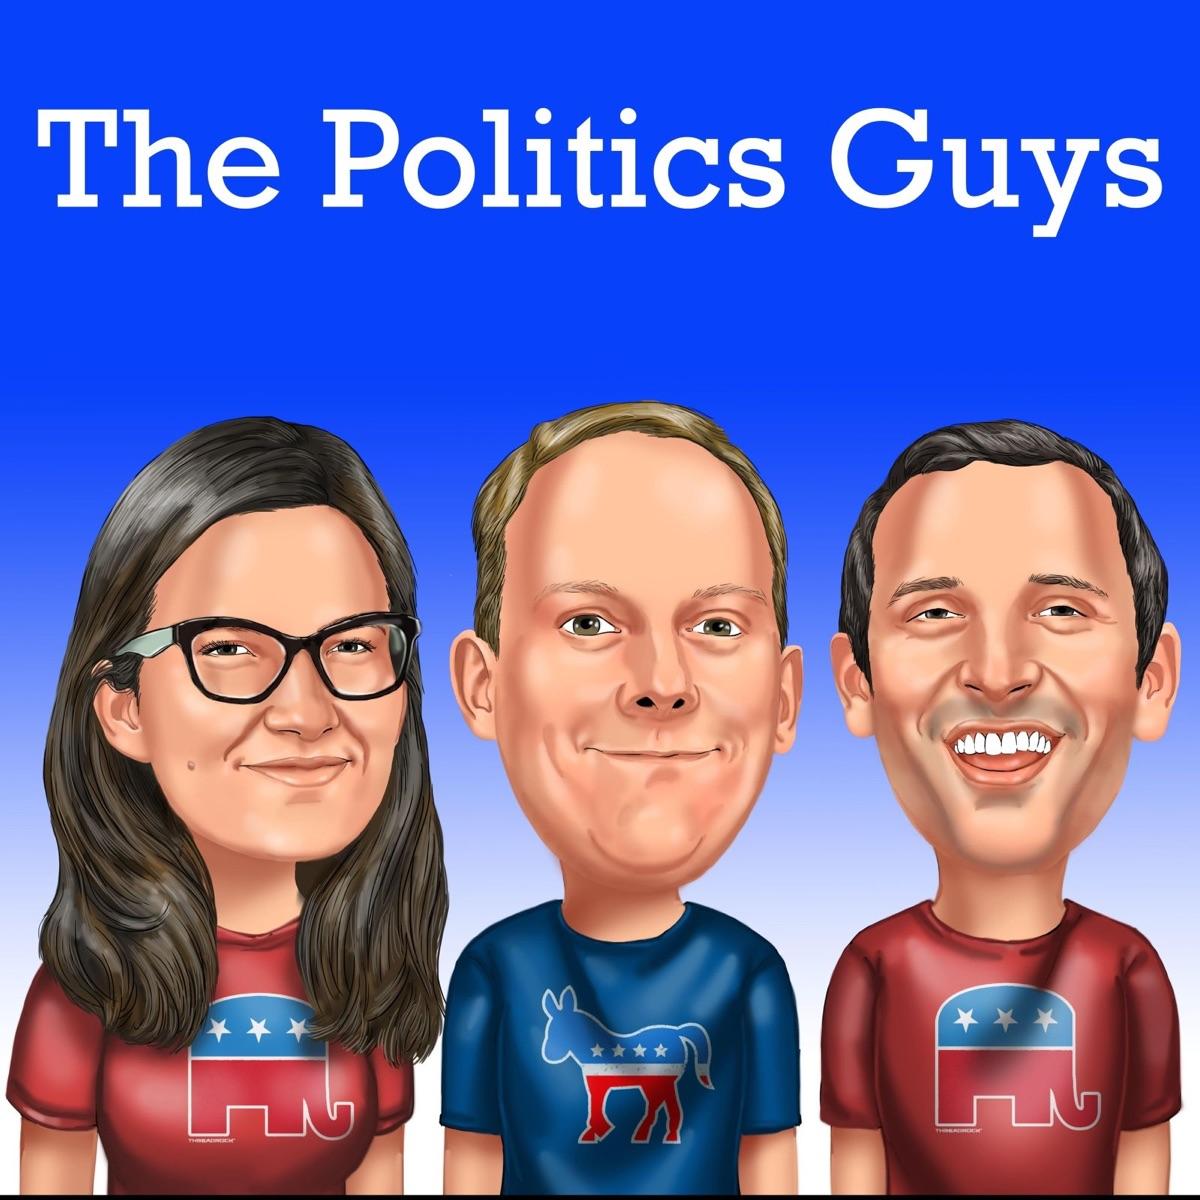 The Politics Guys